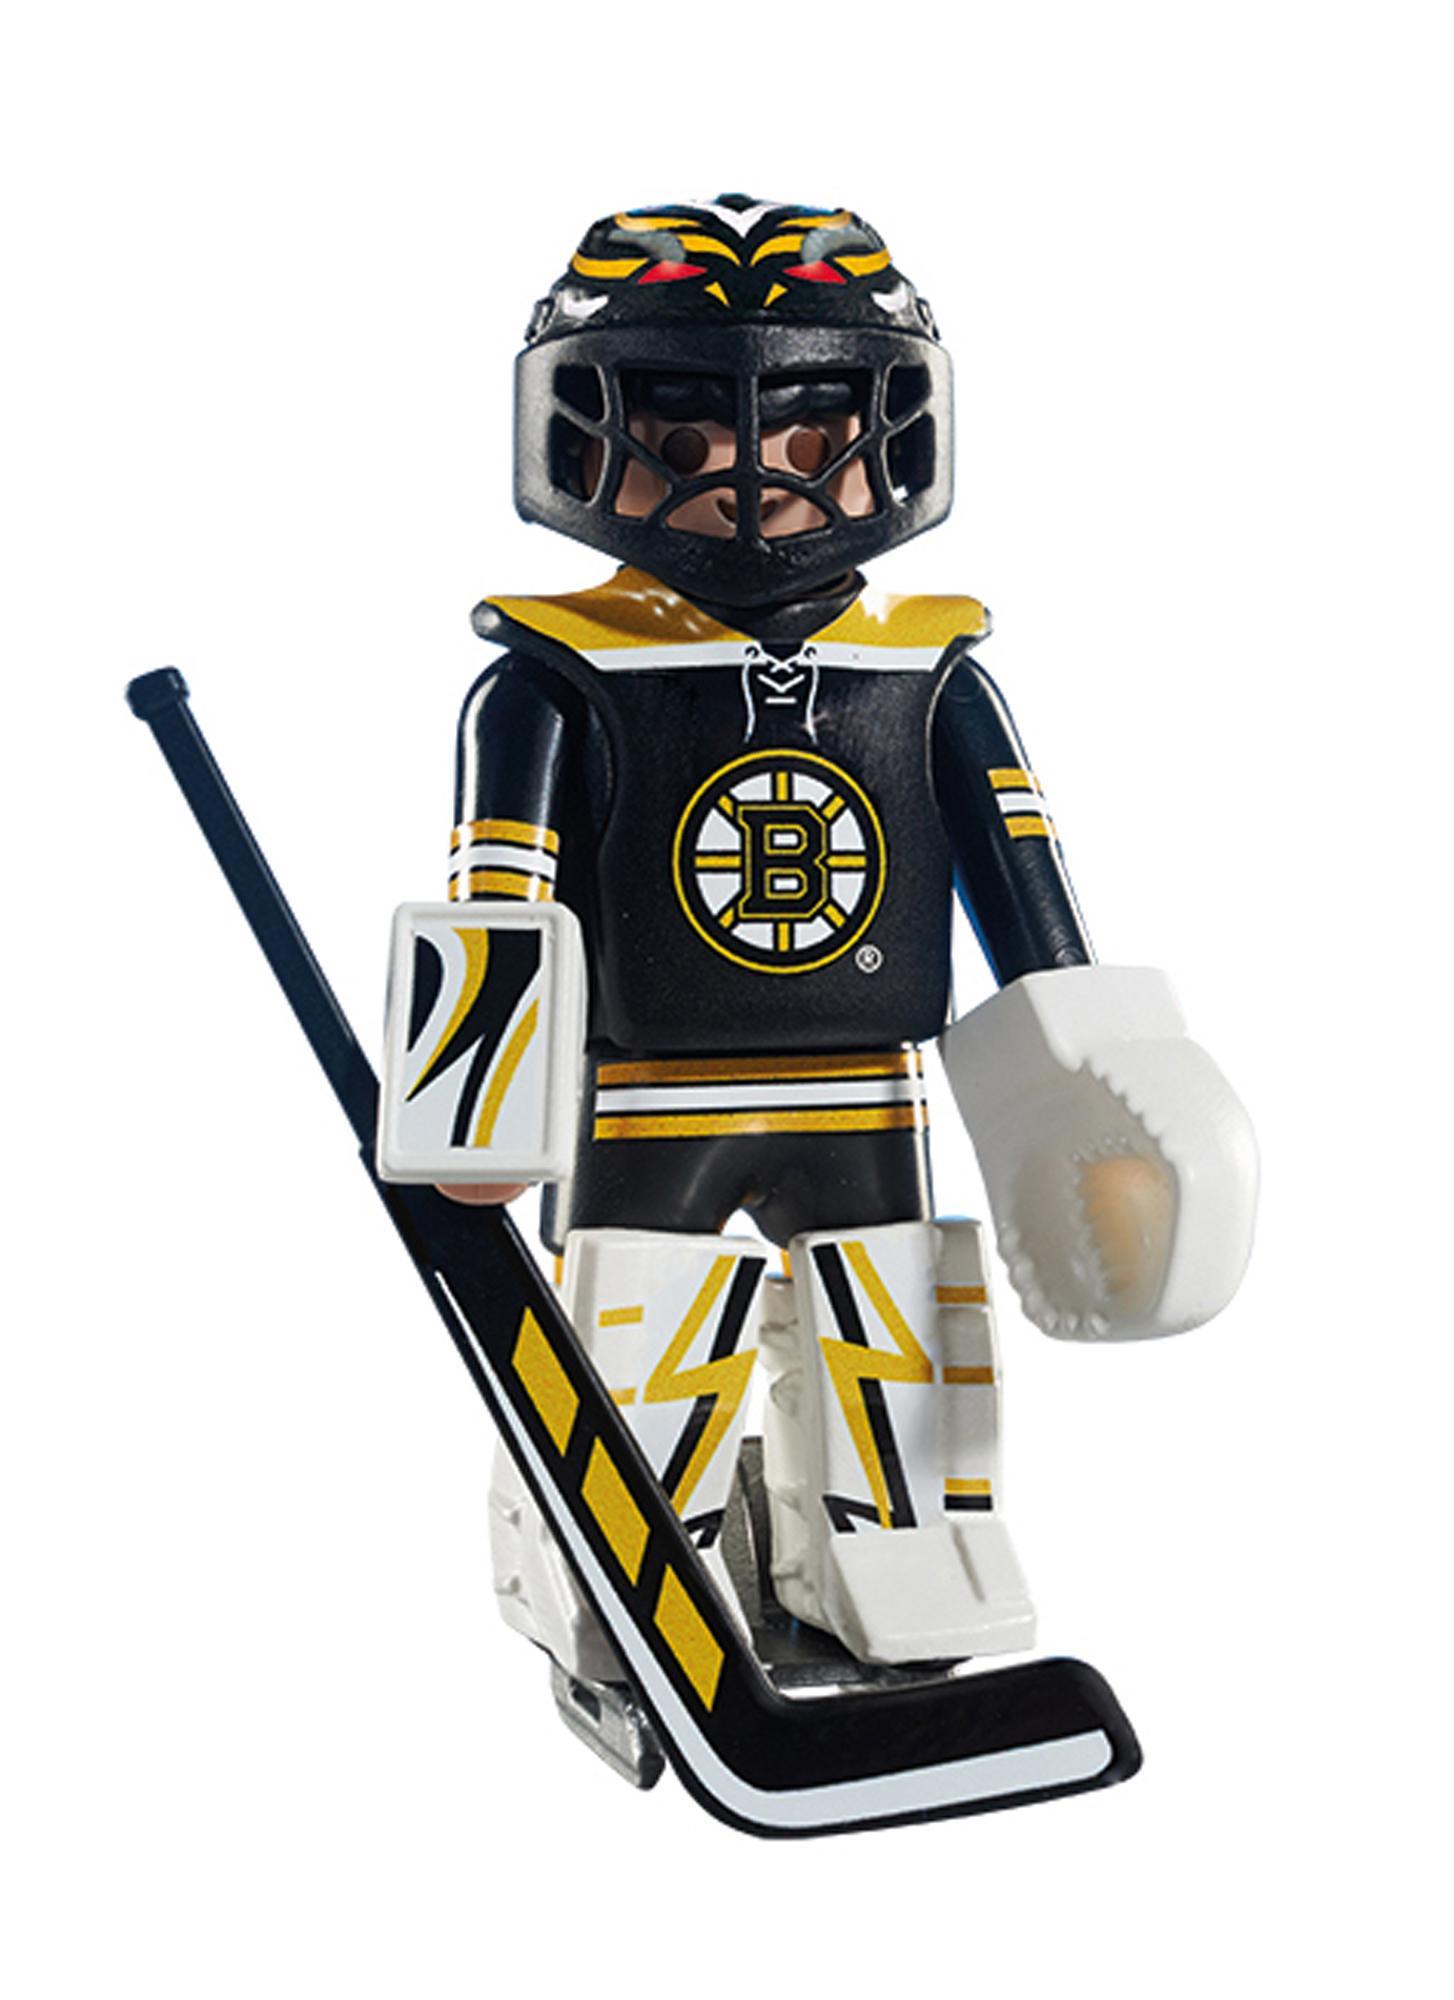 Playmobil Nhl Bruins Goalie Storage Amp Accessories